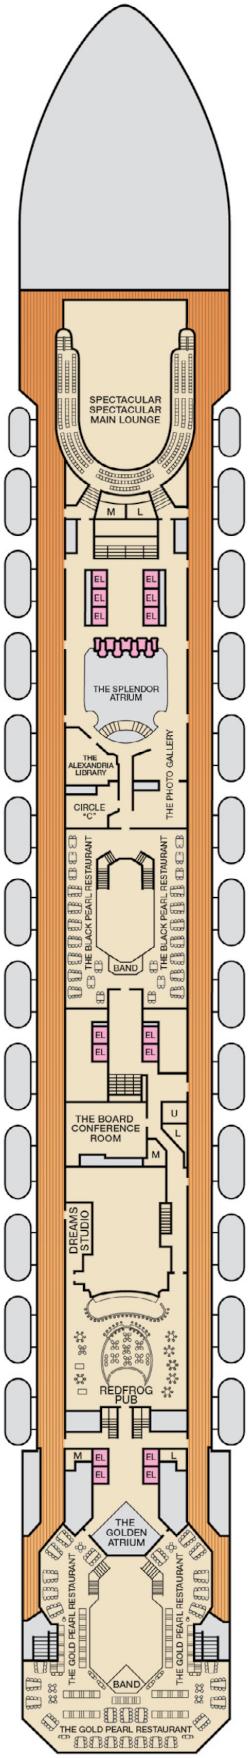 Carnival Splendor Atlantic Deck Deck Plan